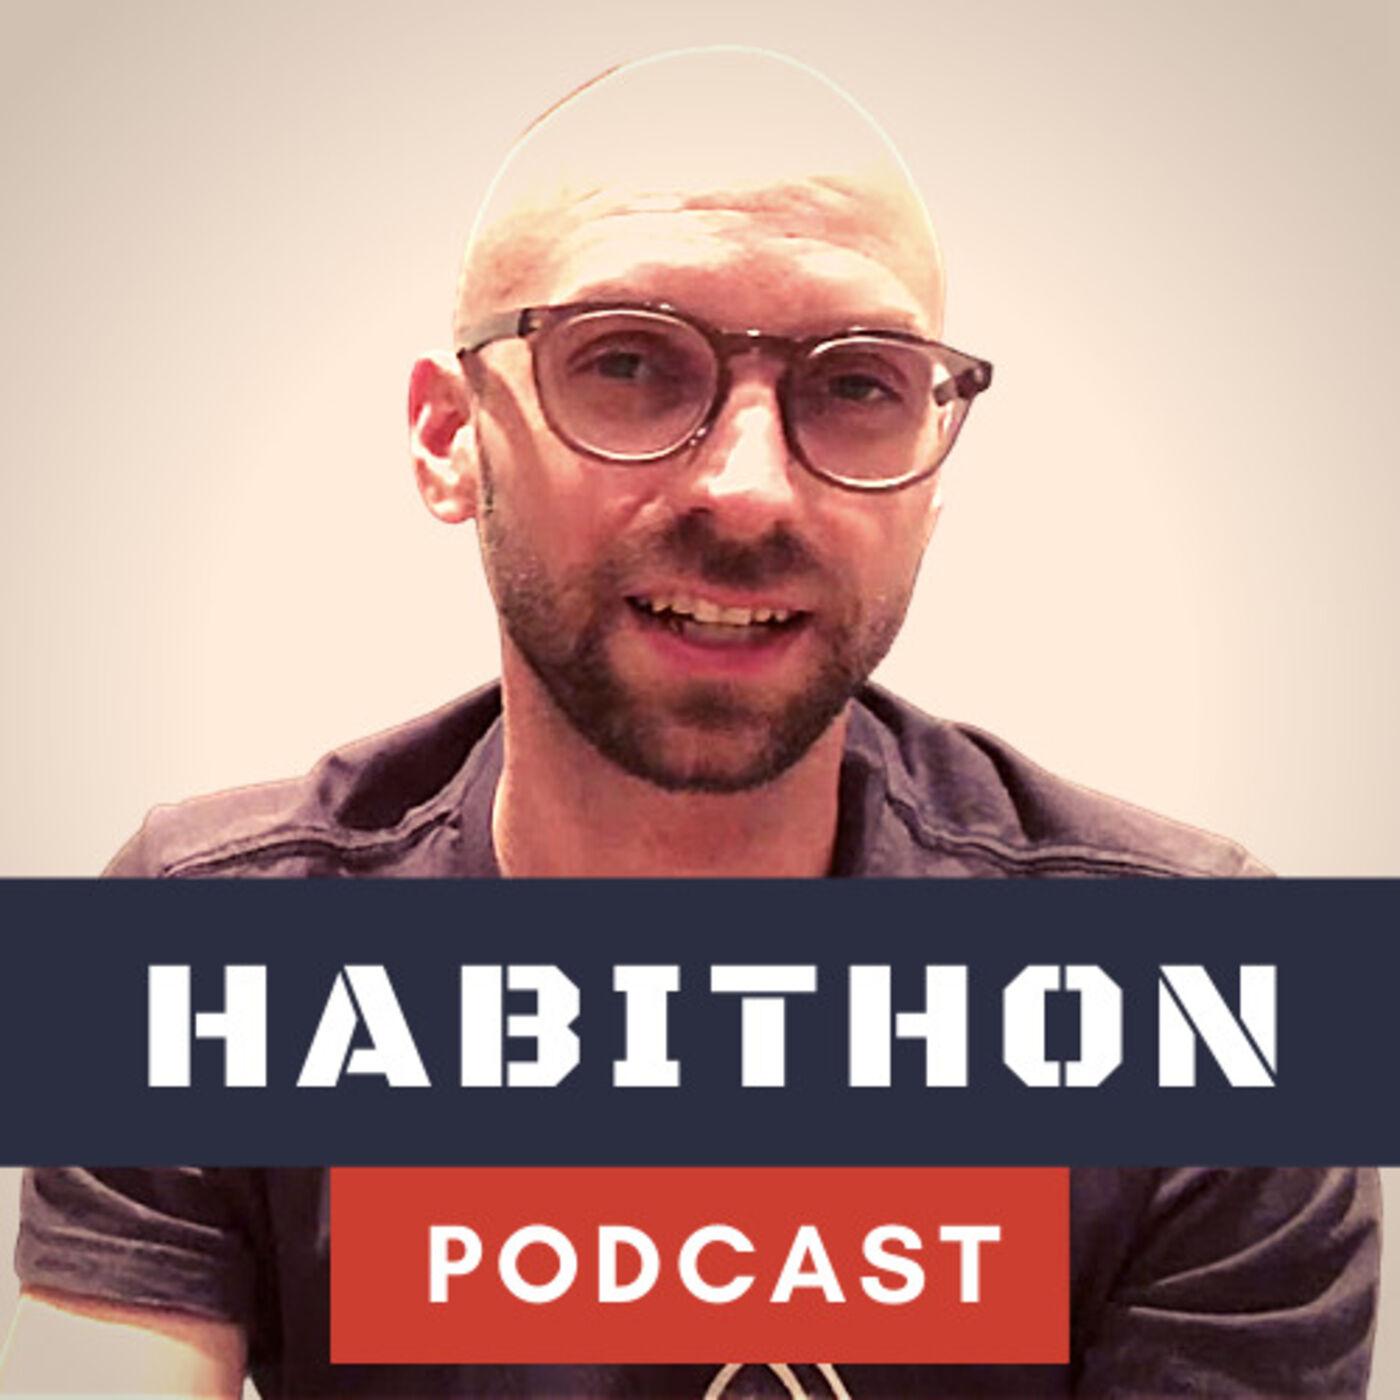 #28 Habits of a Successful Serial-Entrepreneur (ft. Karsten Deppert)